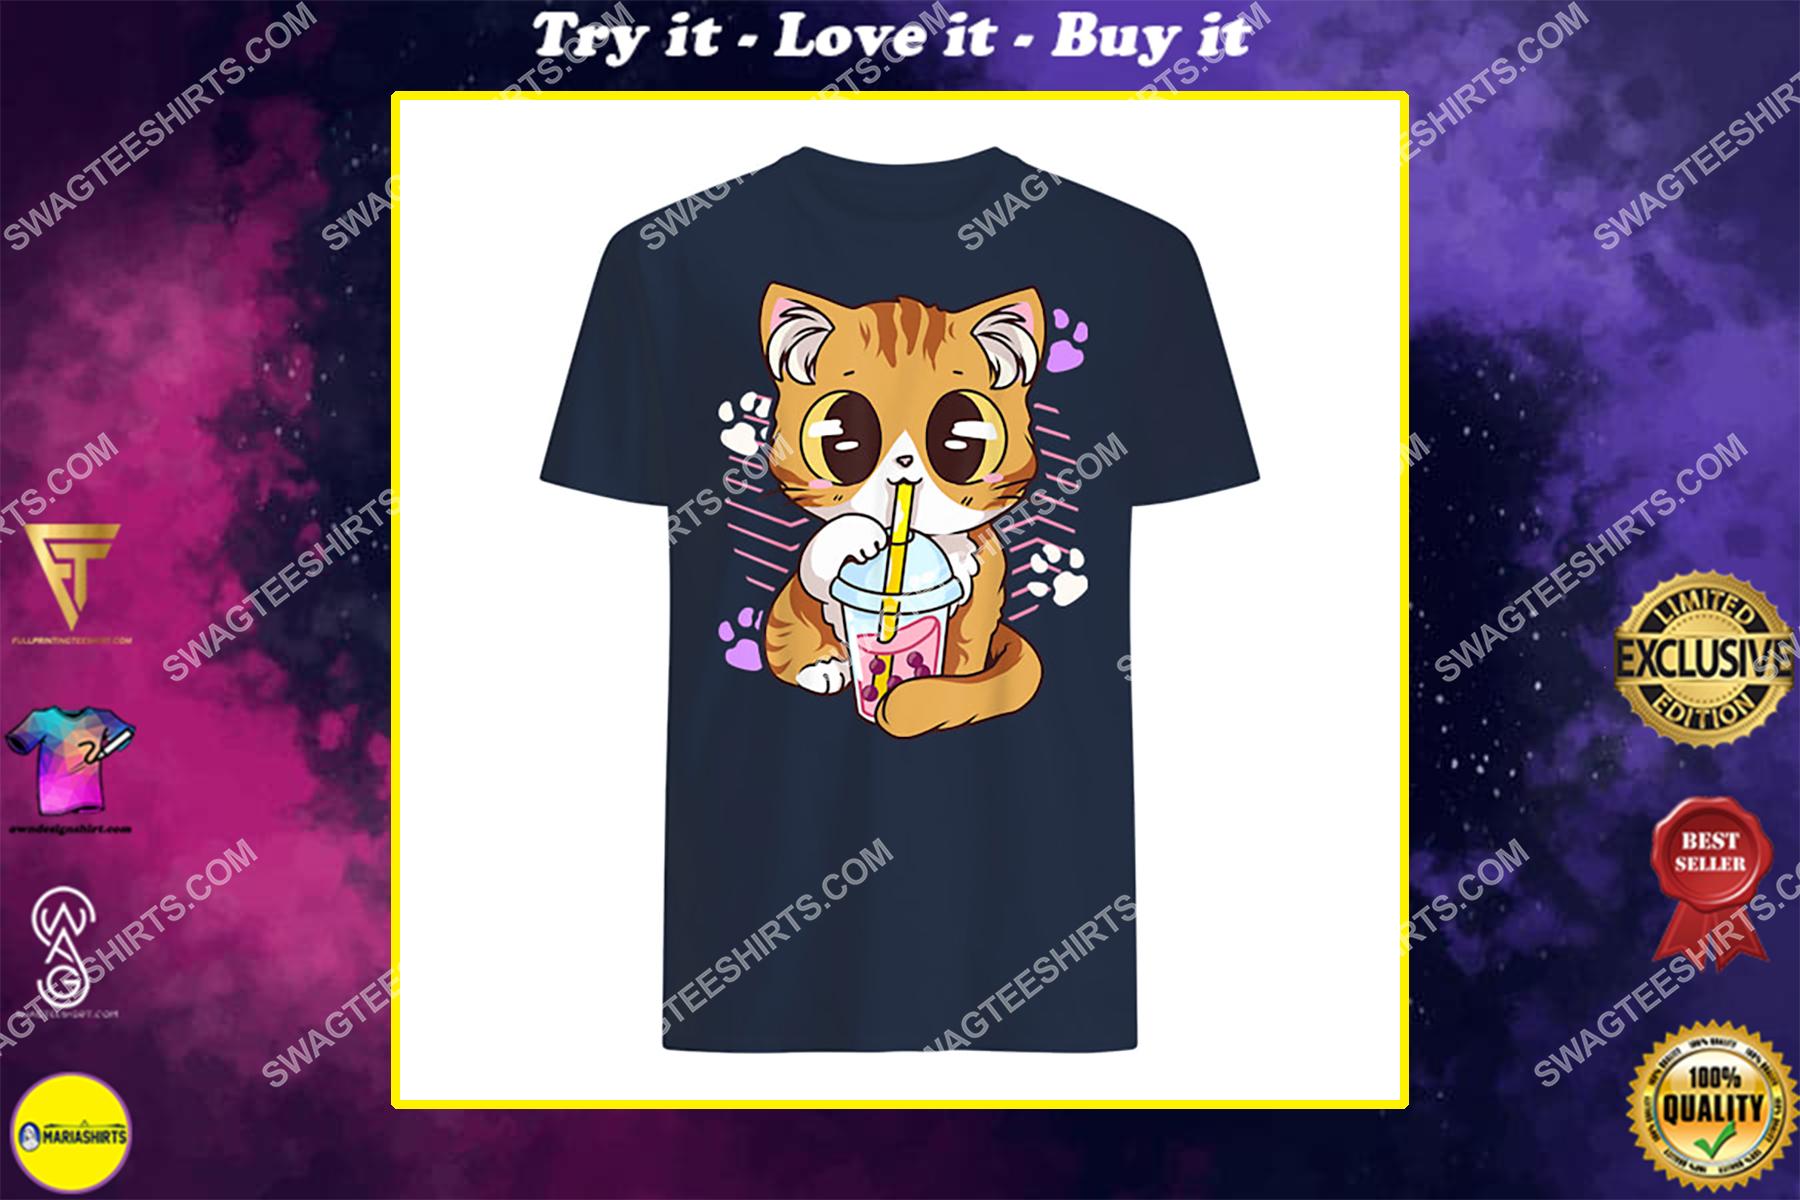 kawaii cat boba bubble milk tea anime neko kitten shirt